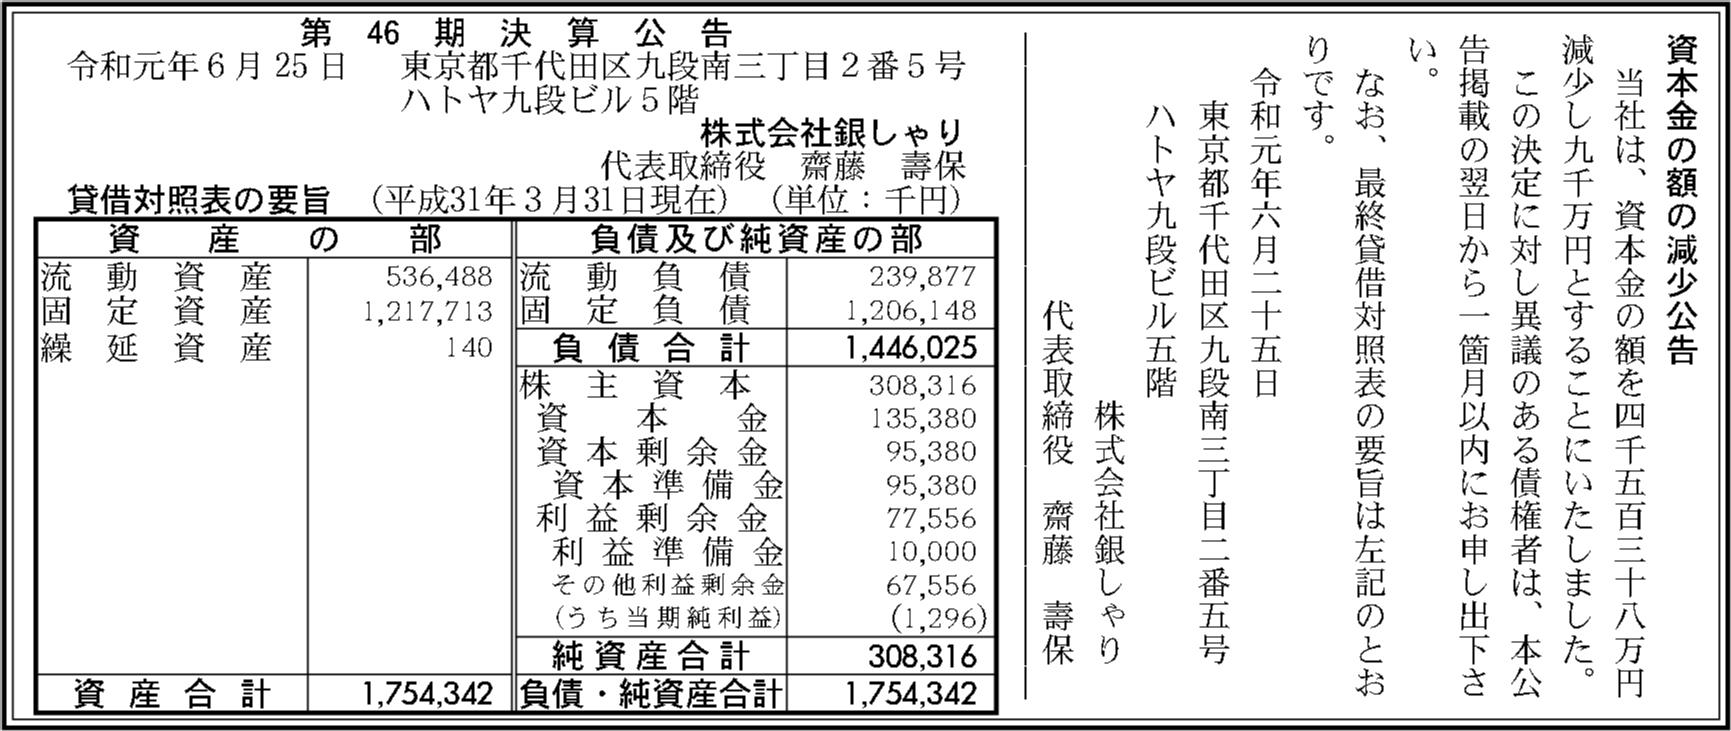 0140 d2cb5d84ba4782a09bb7ac578392d59bd025518e359cd12fd3d500a94e32227f5cf81e332d68fdeefc38750ae6e6581655ba0b92892be84b539f8a20ce6cd517 04